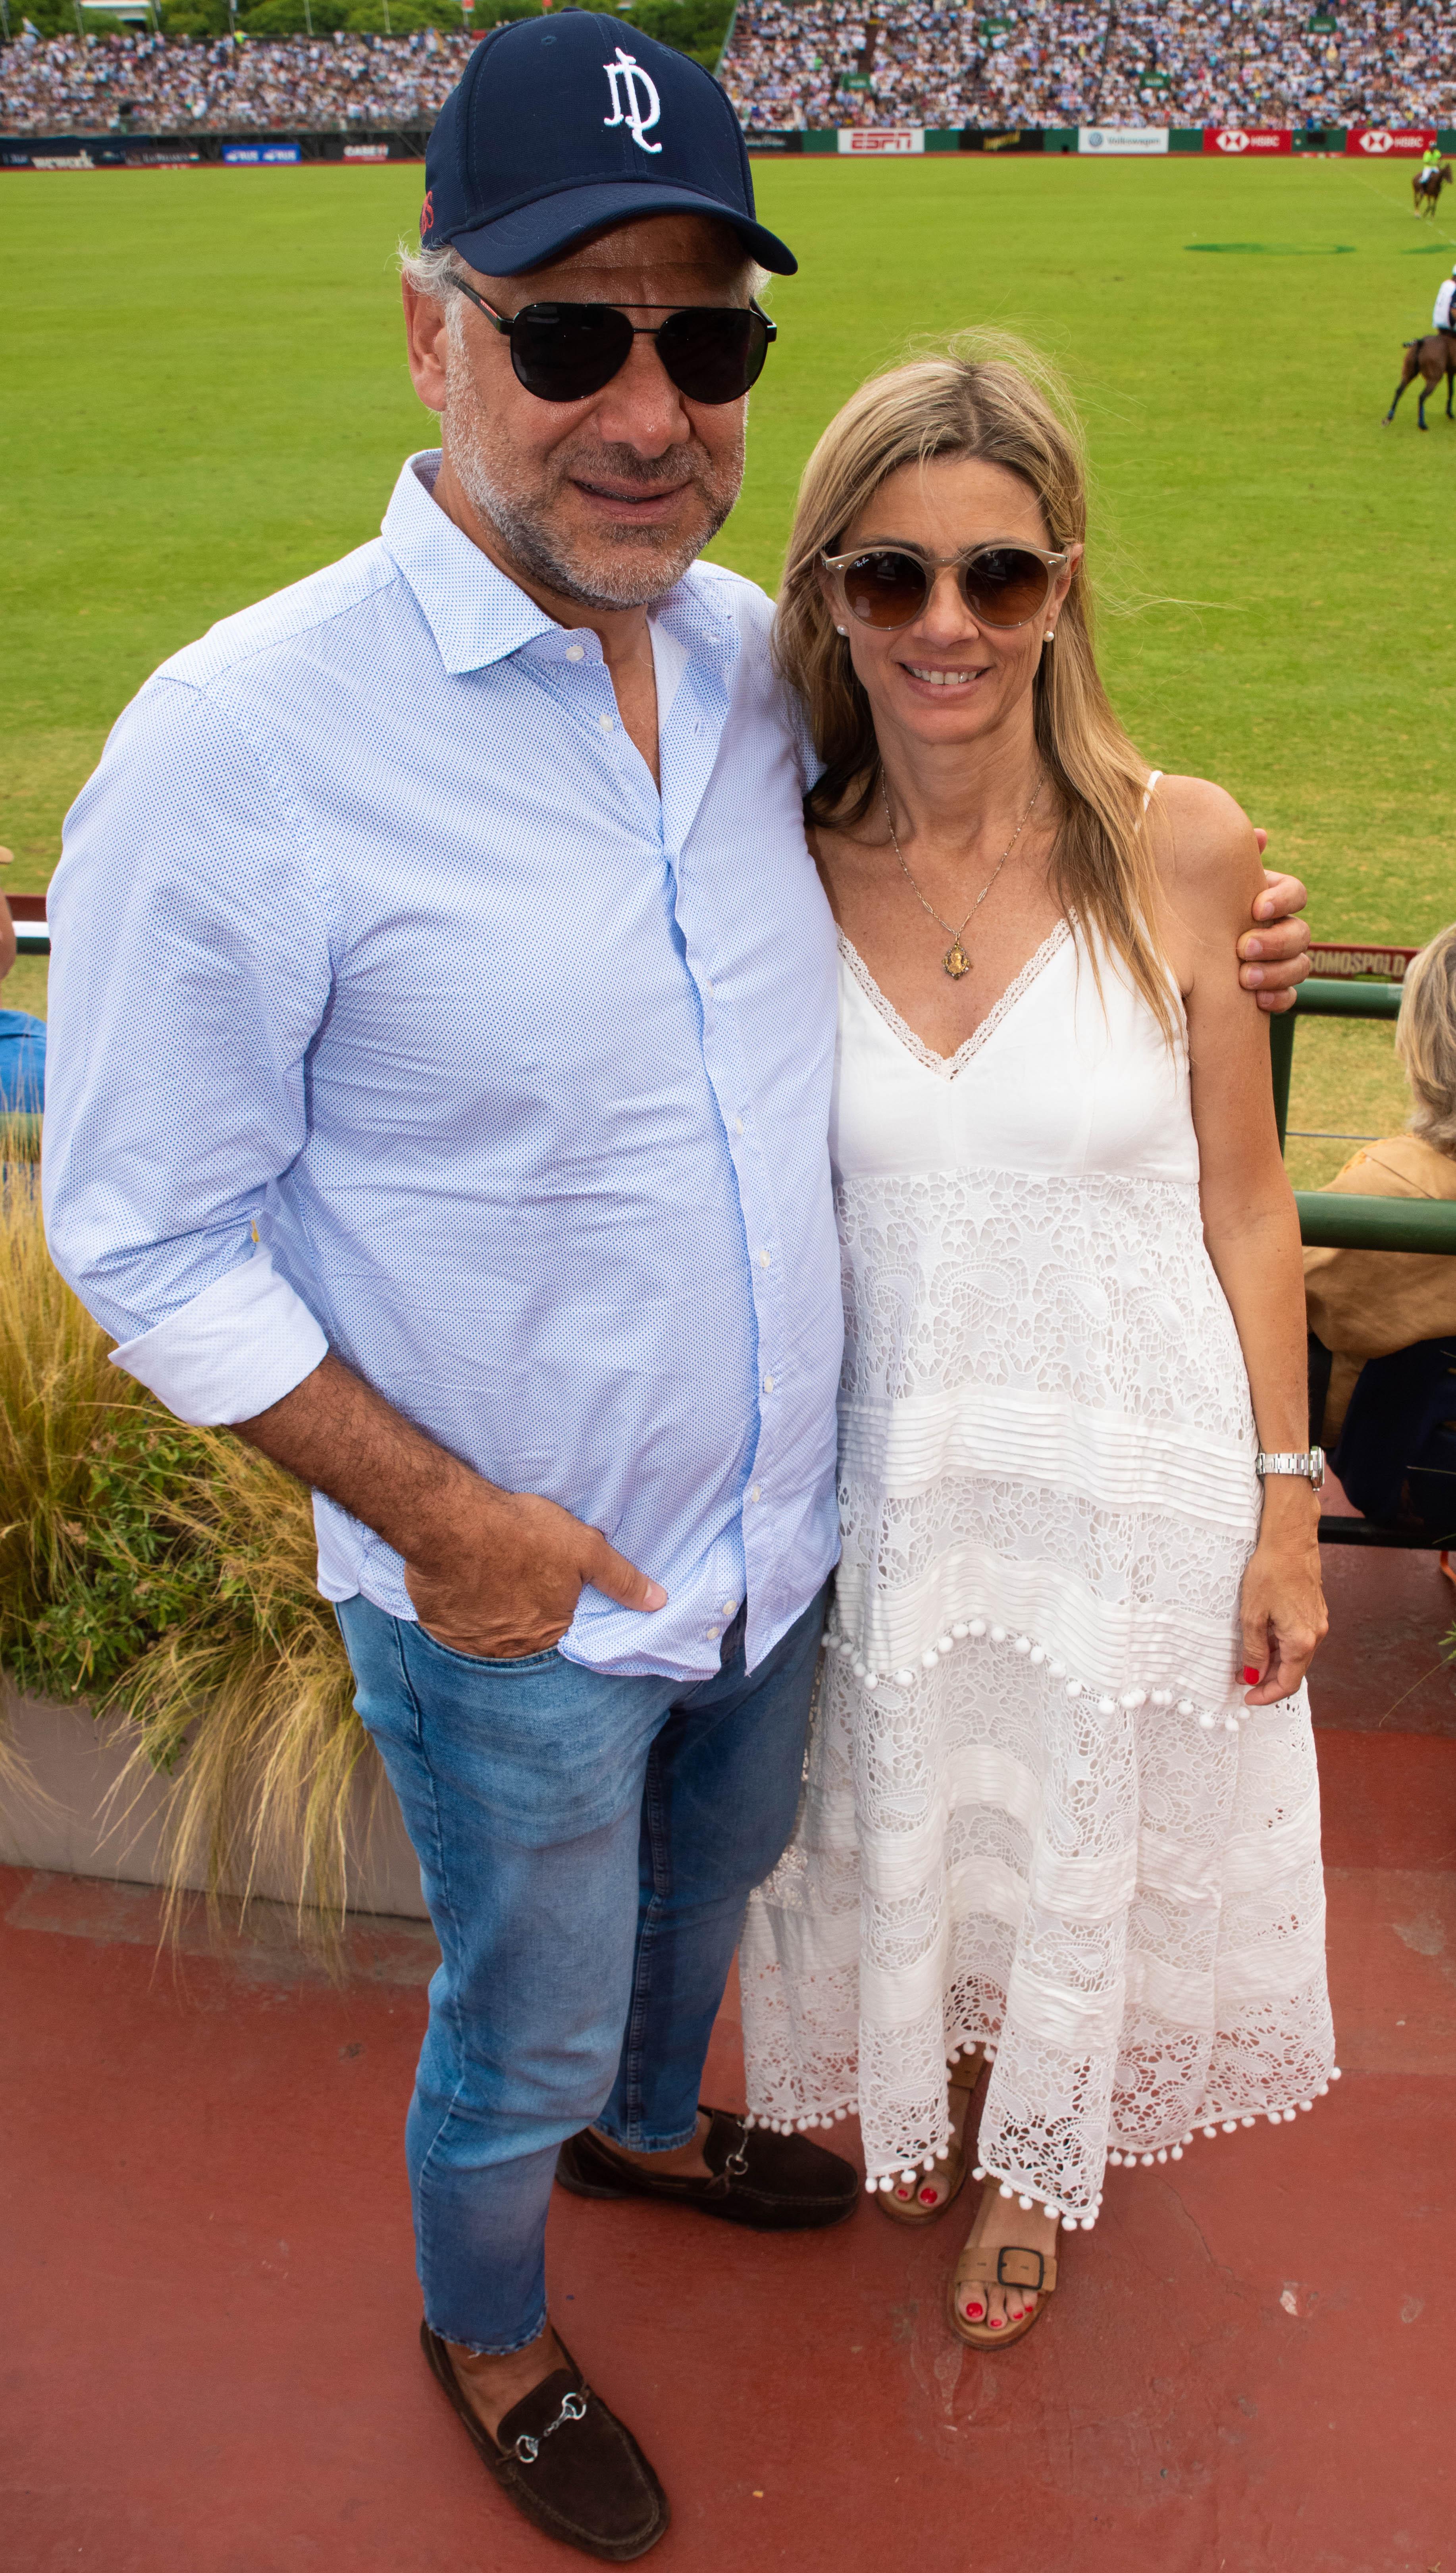 Luis Galli y Angie Reyser